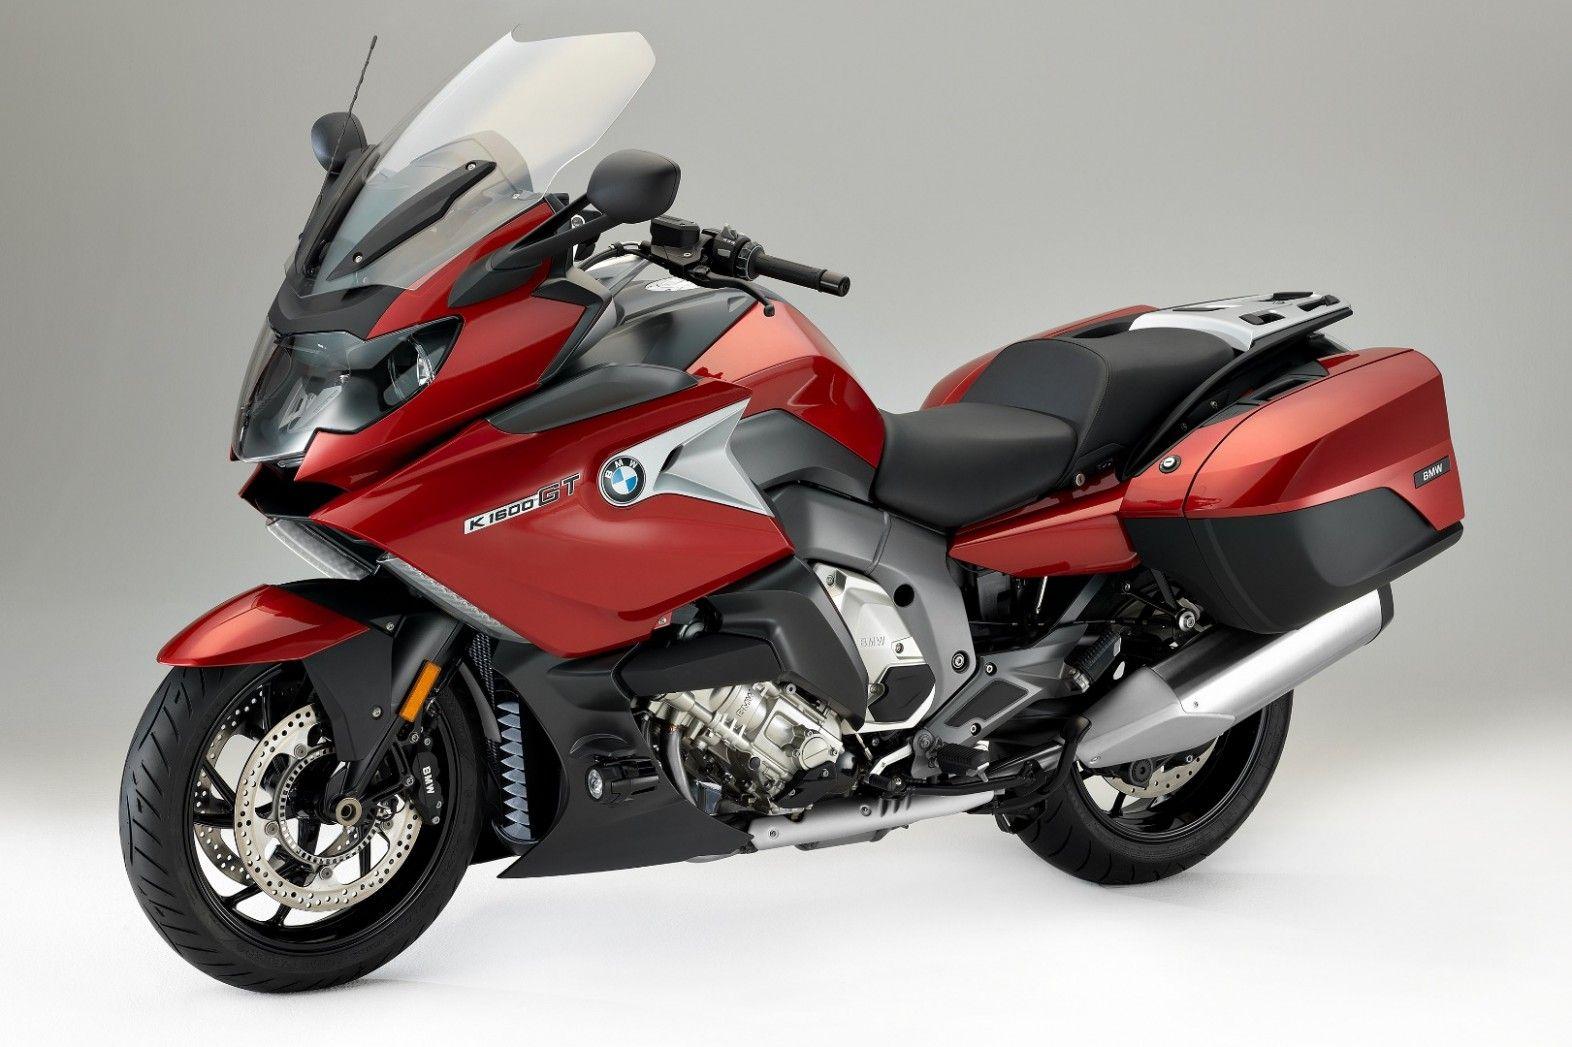 2020 Bmw K1600gtl Release Bmw Motorrad 2017 Bmw Bmw Motorcycle